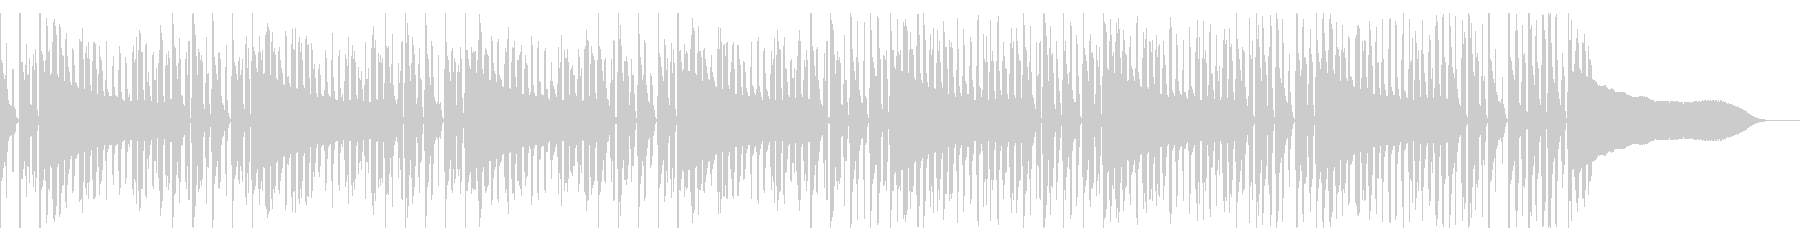 Vocal FX、114 BPMの未再生の波形